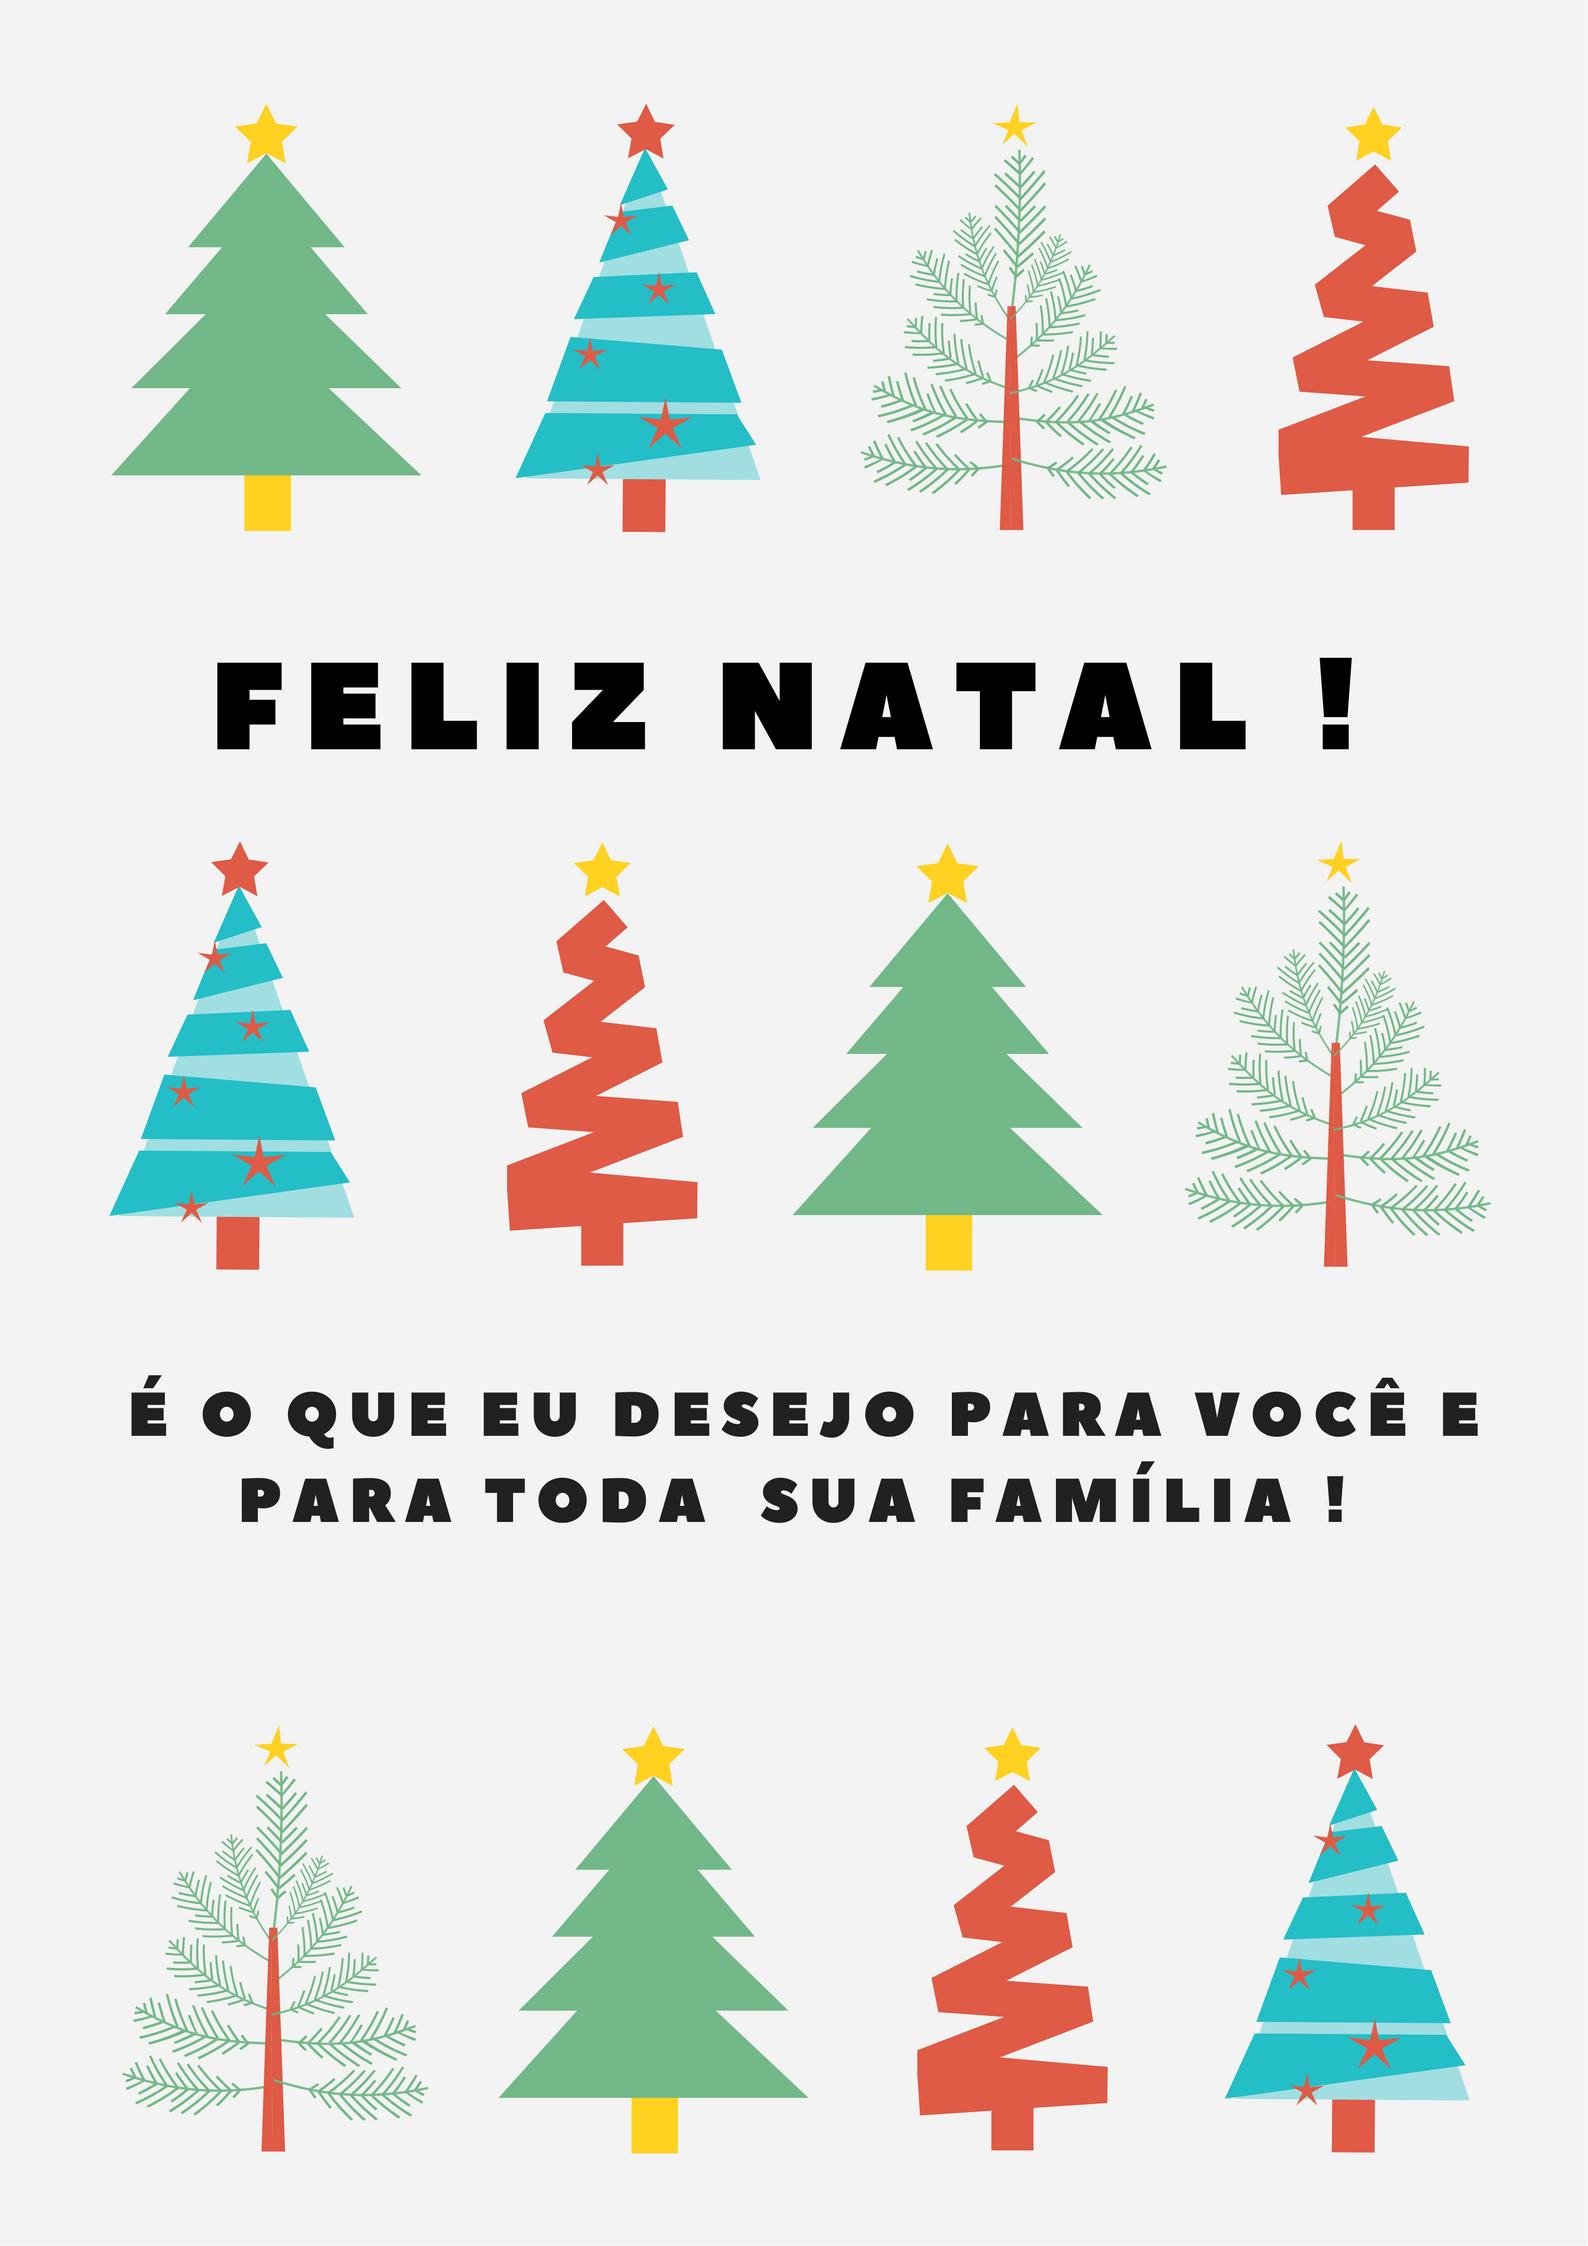 feliz-natal-2-1